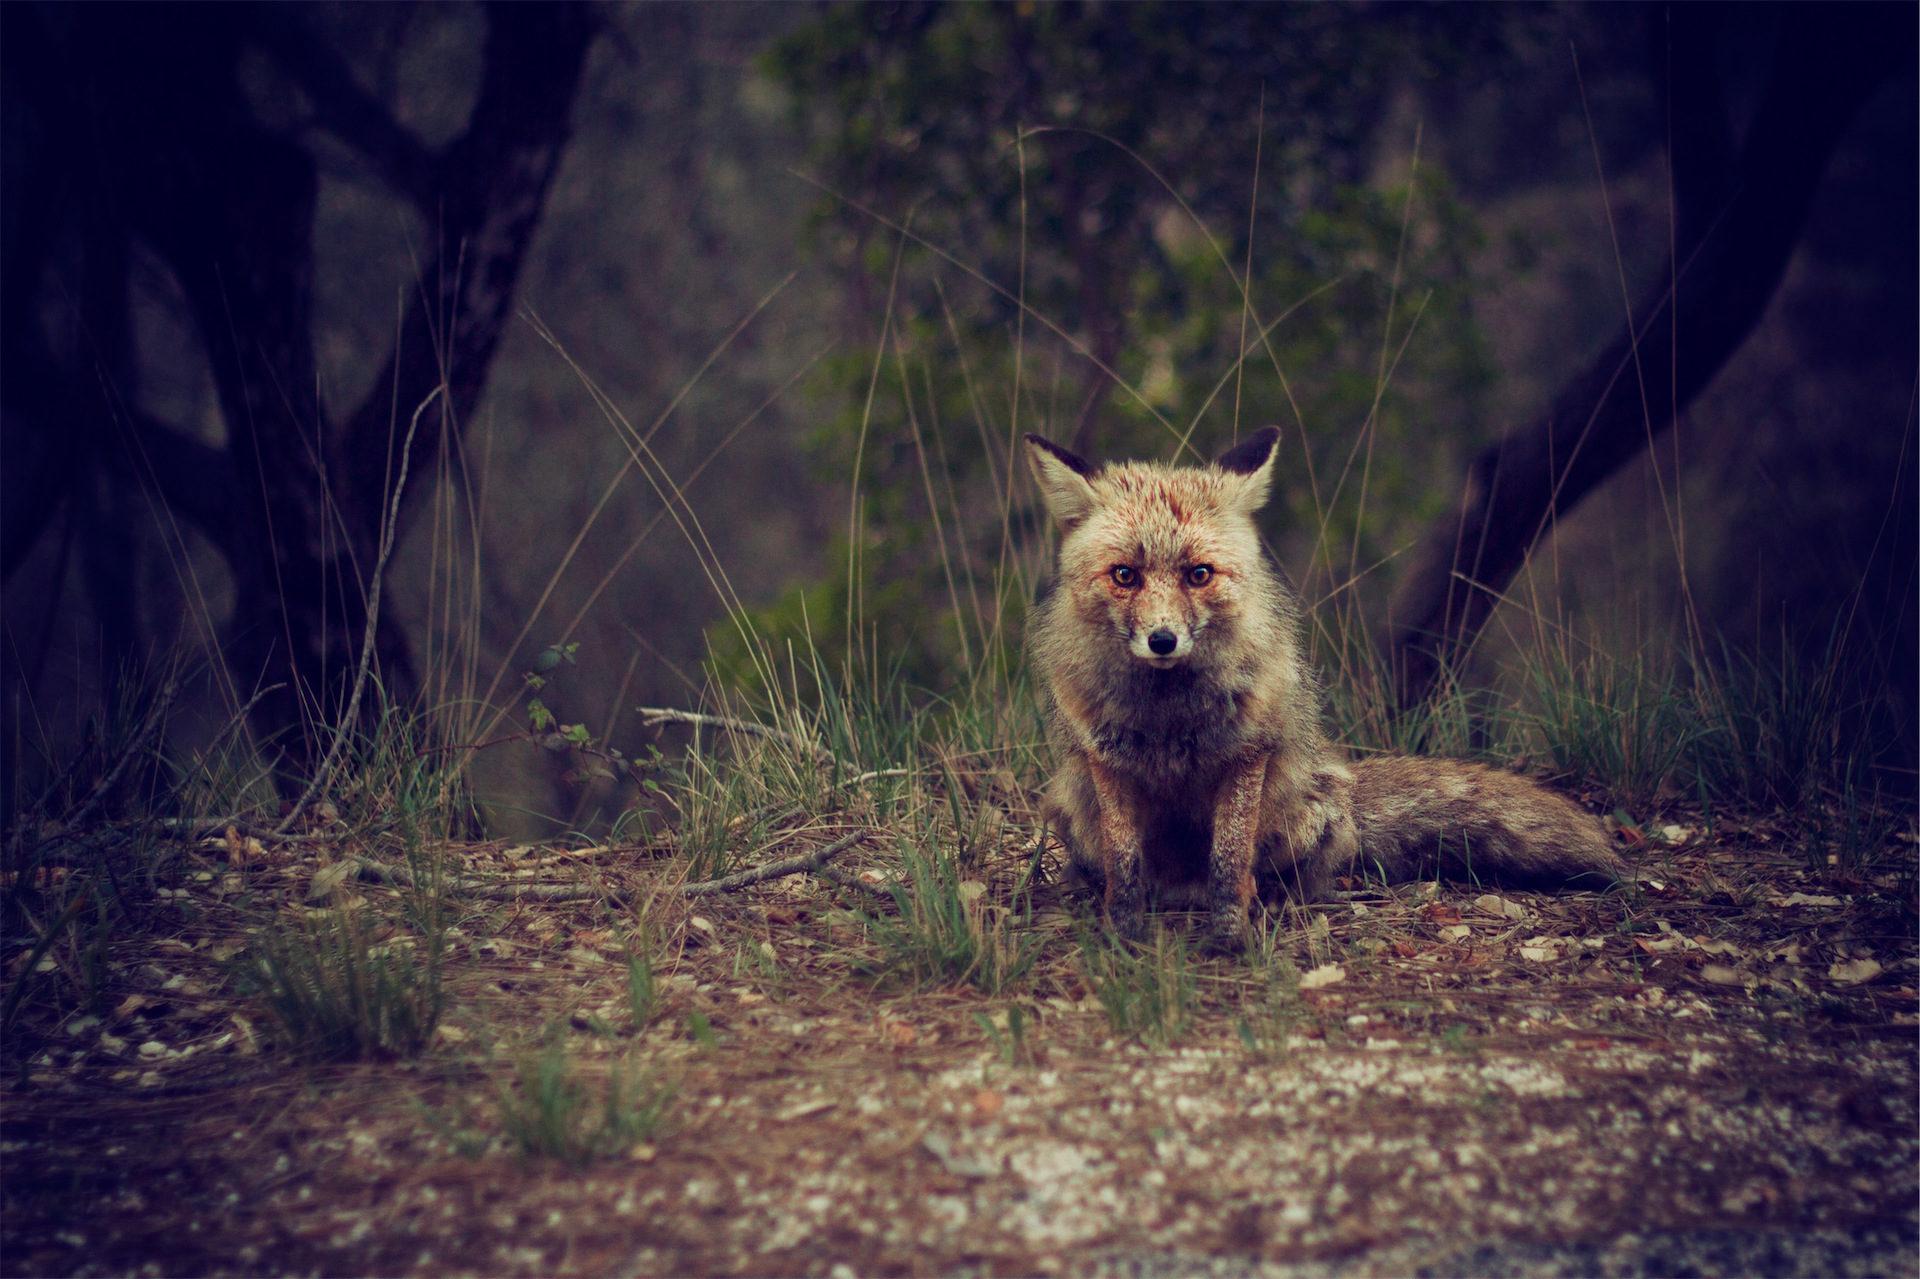 Zorro, foresta, campo, sguardo, Crafty - Sfondi HD - Professor-falken.com